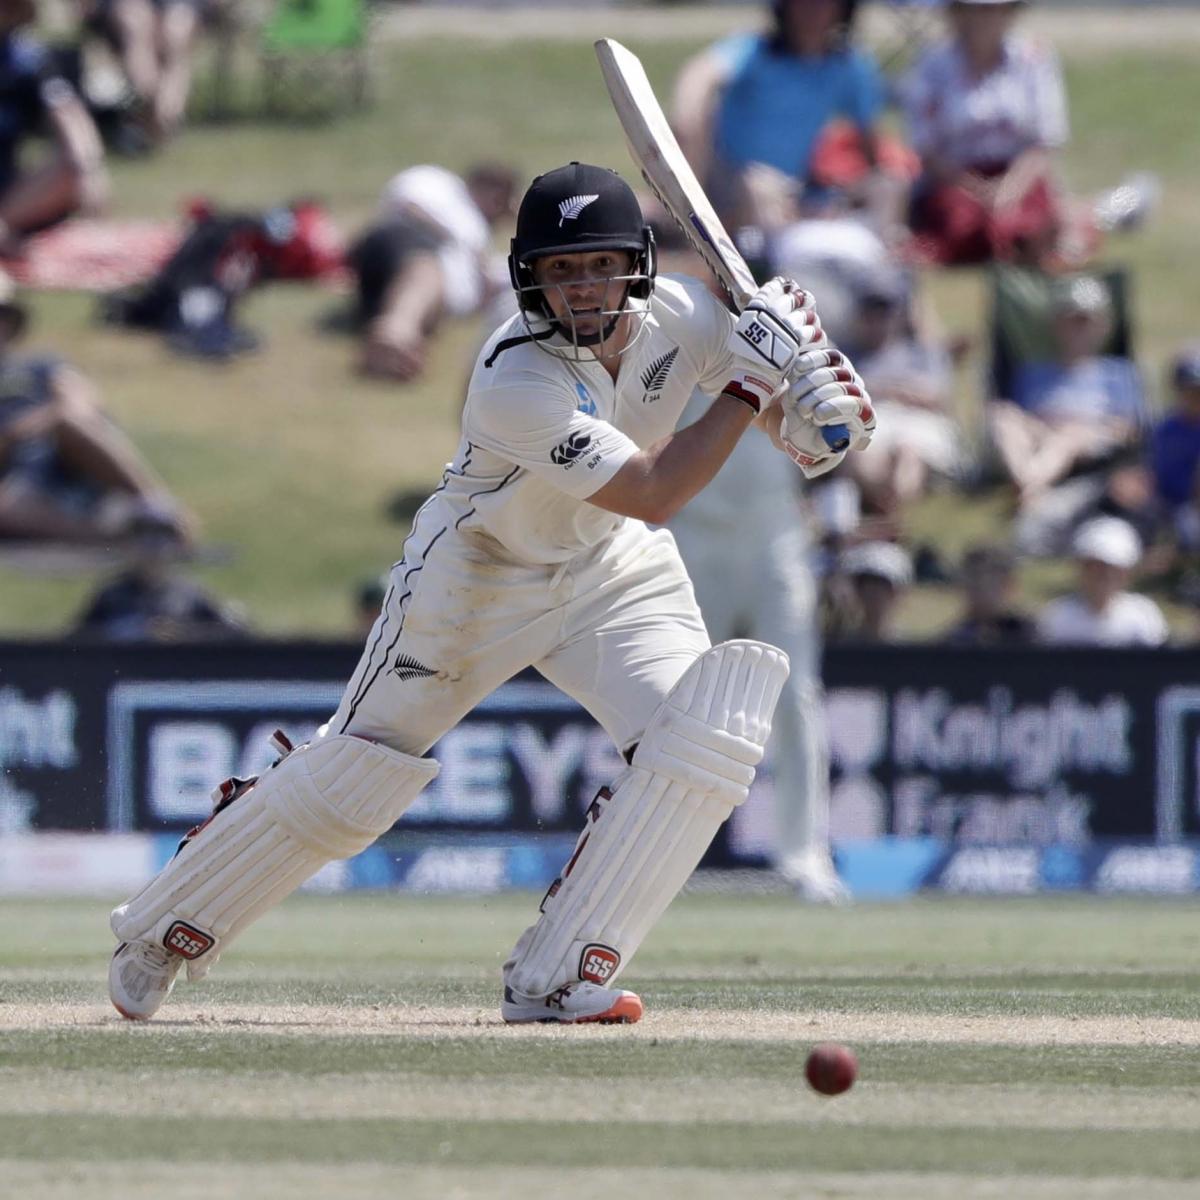 New Zealand vs England: Watling waltzs, Poms struggle